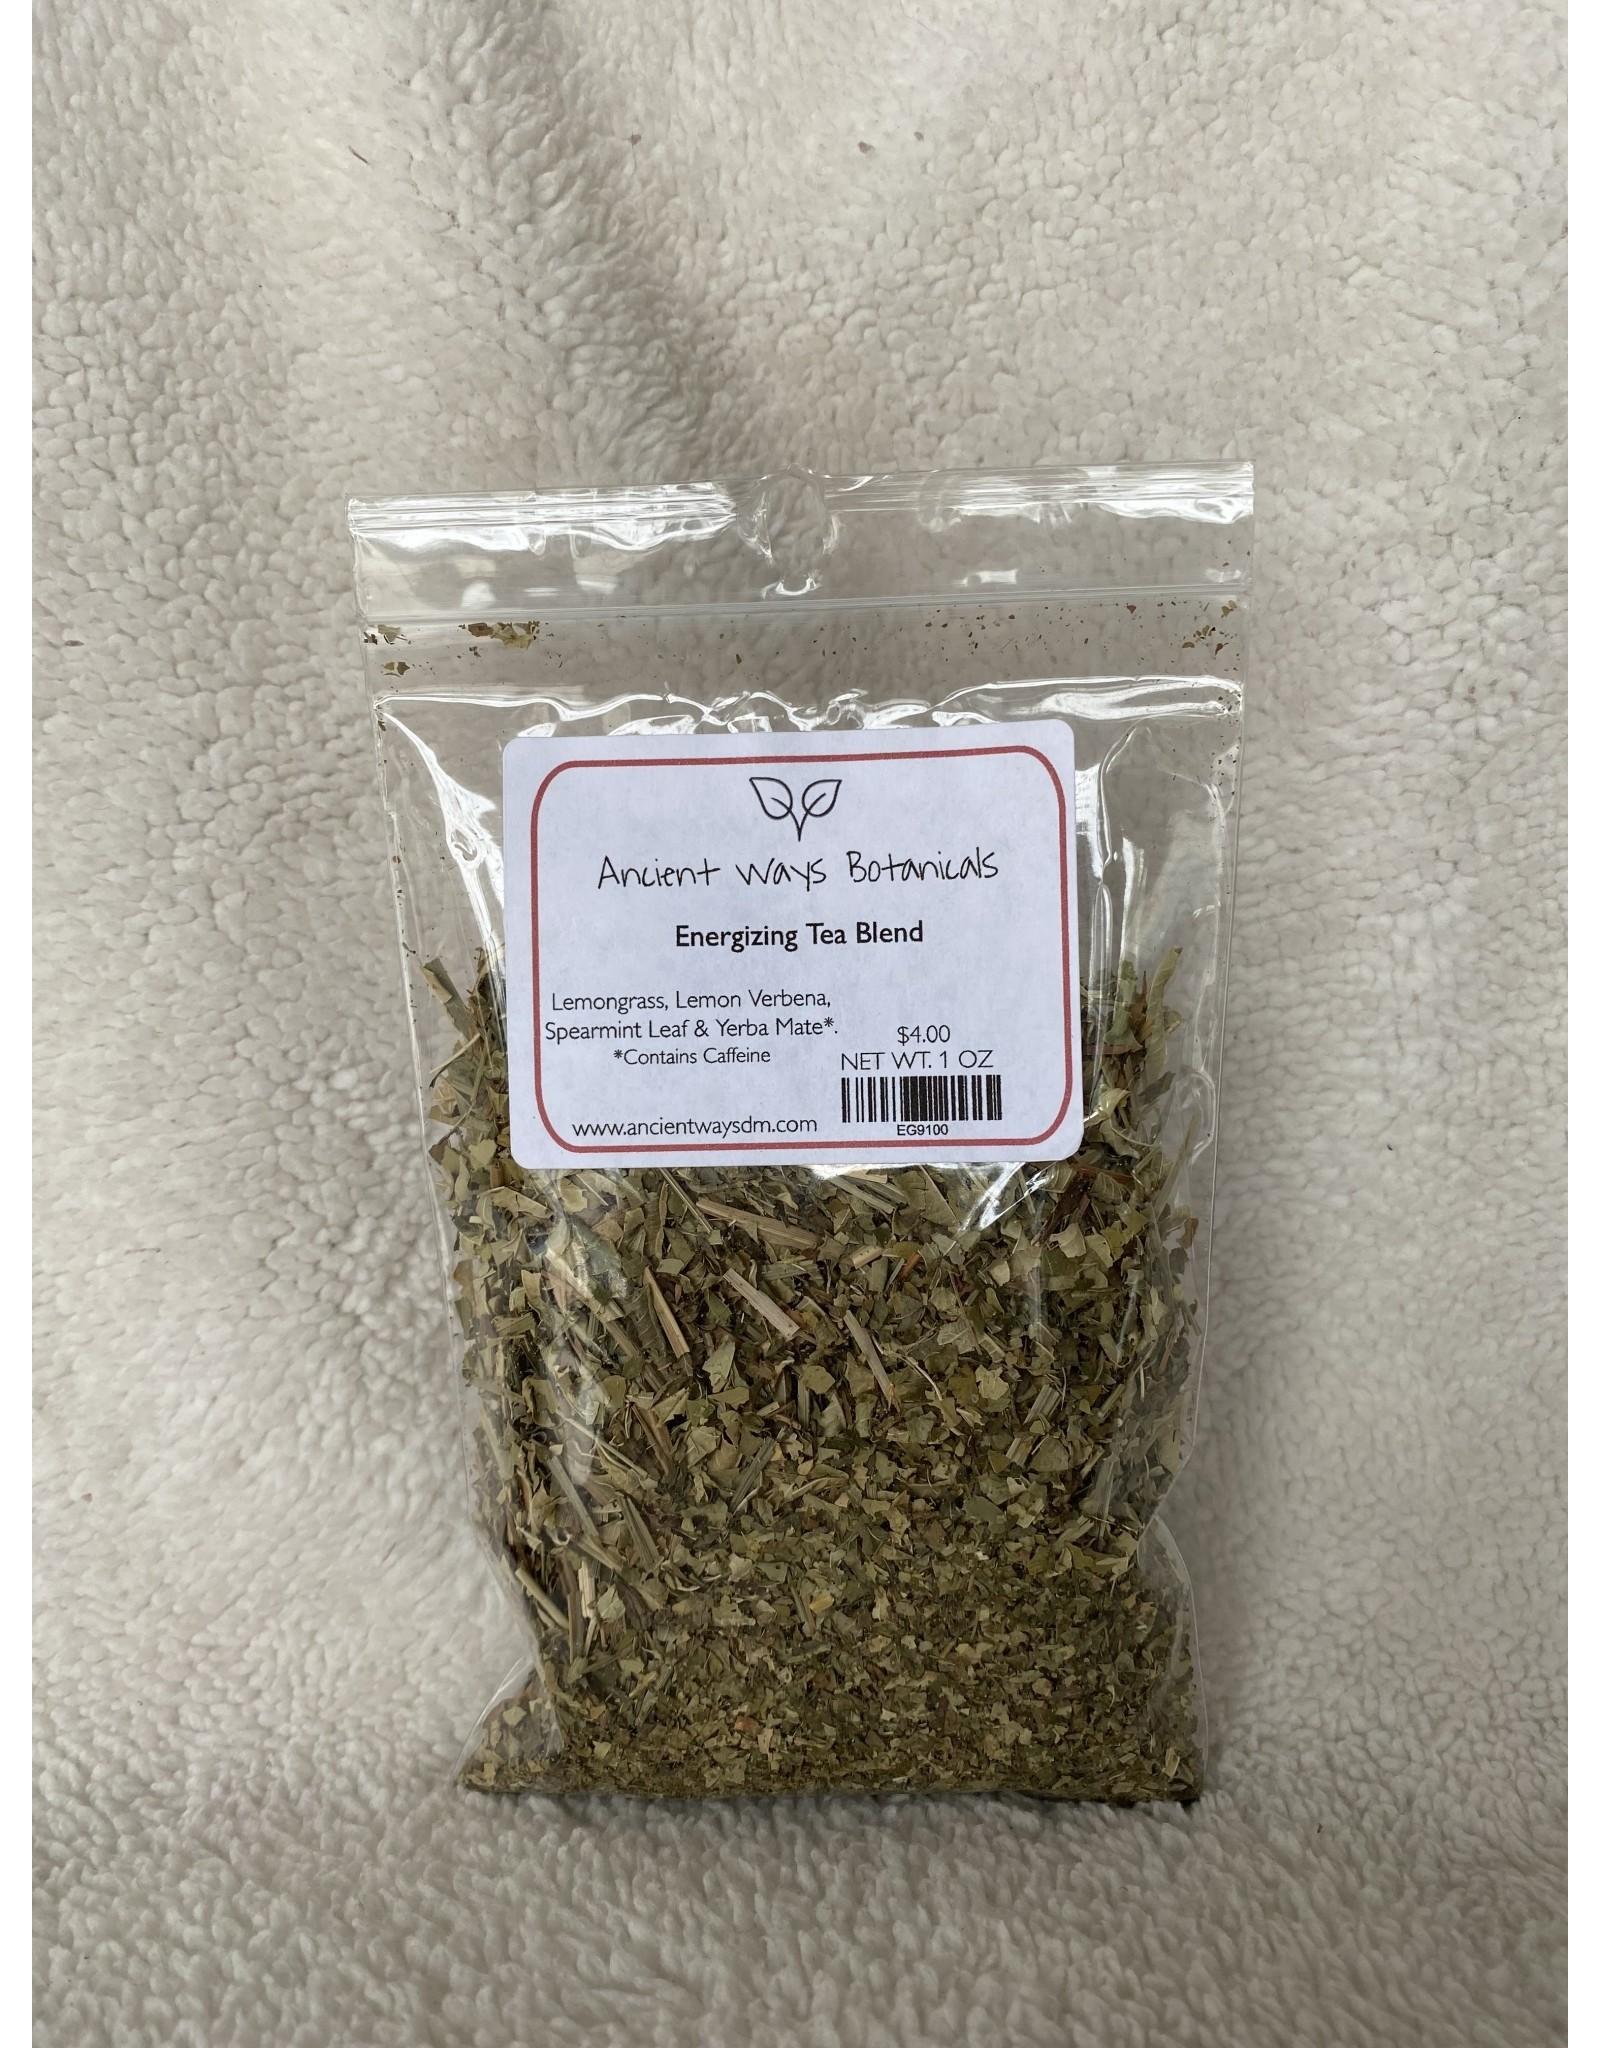 Energizing Tea Blend - 1 oz.